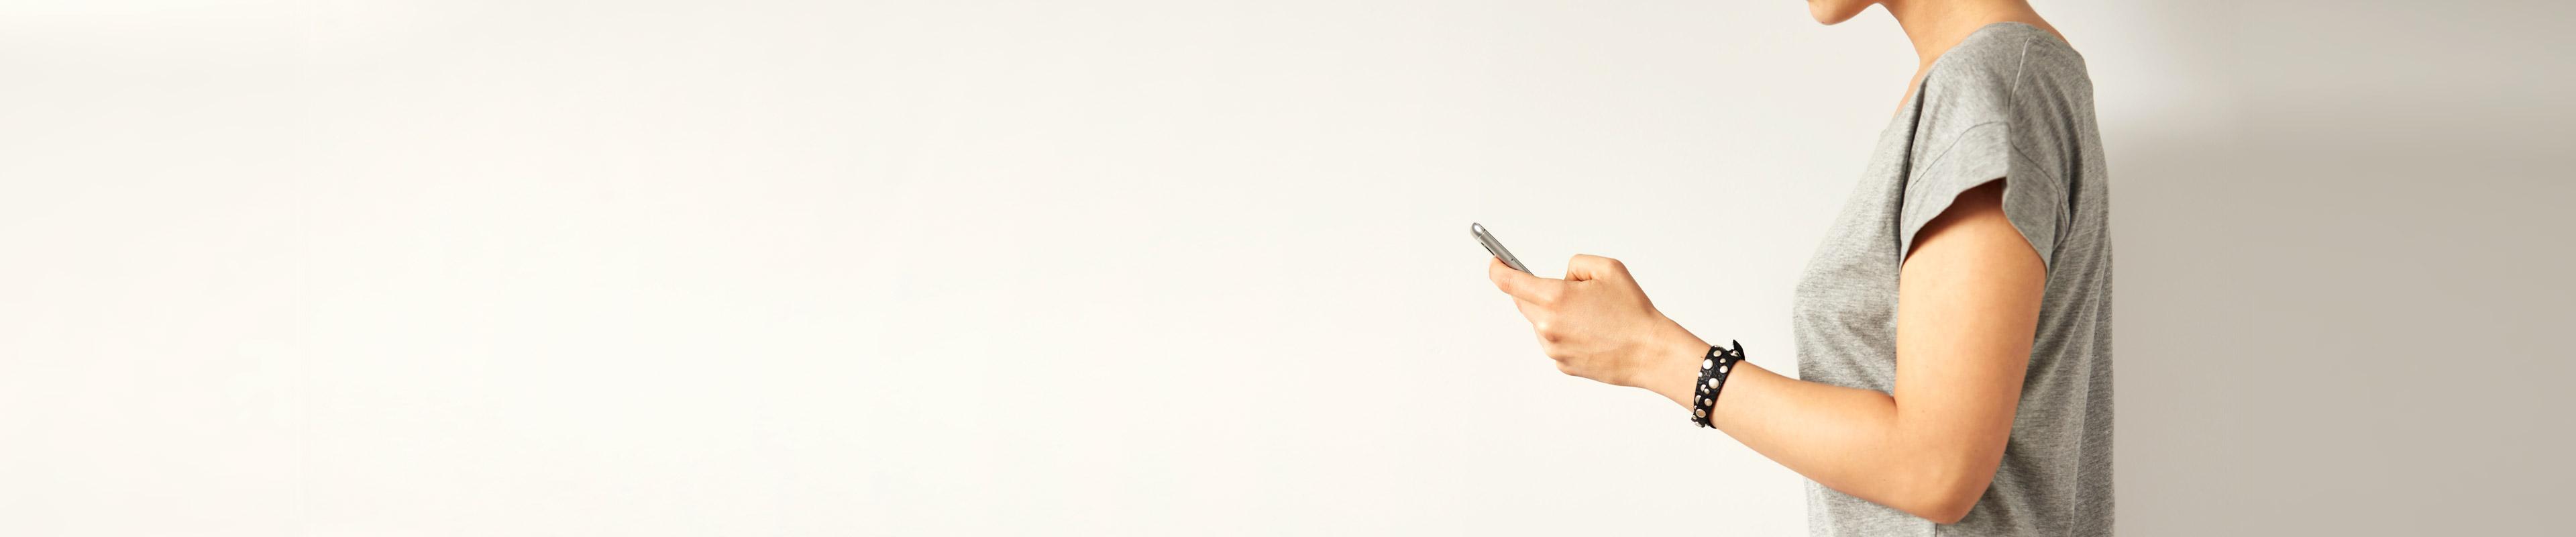 verizon wireless employee discount application